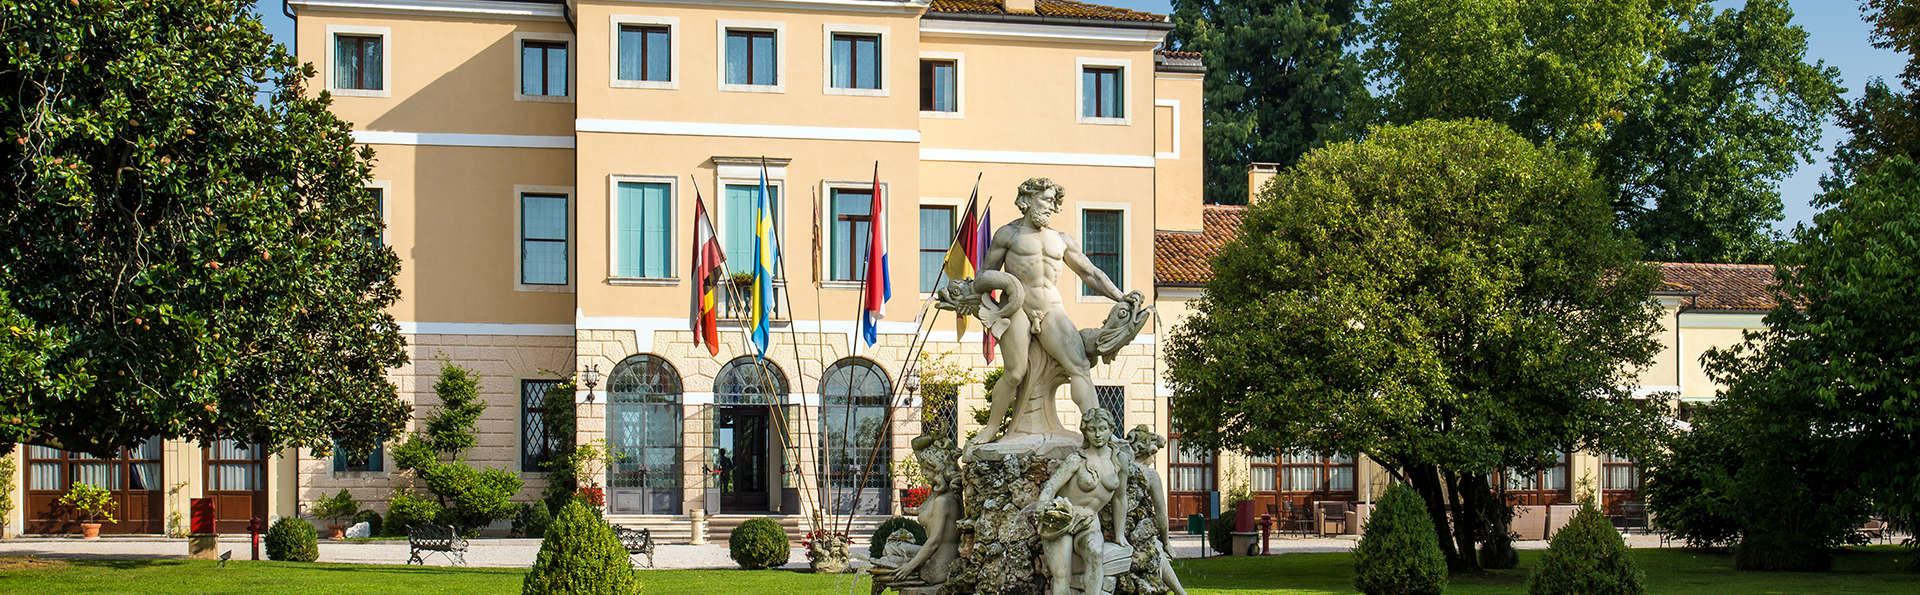 Best Western Plus Hotel Villa Tacchi - edit_facade.jpg